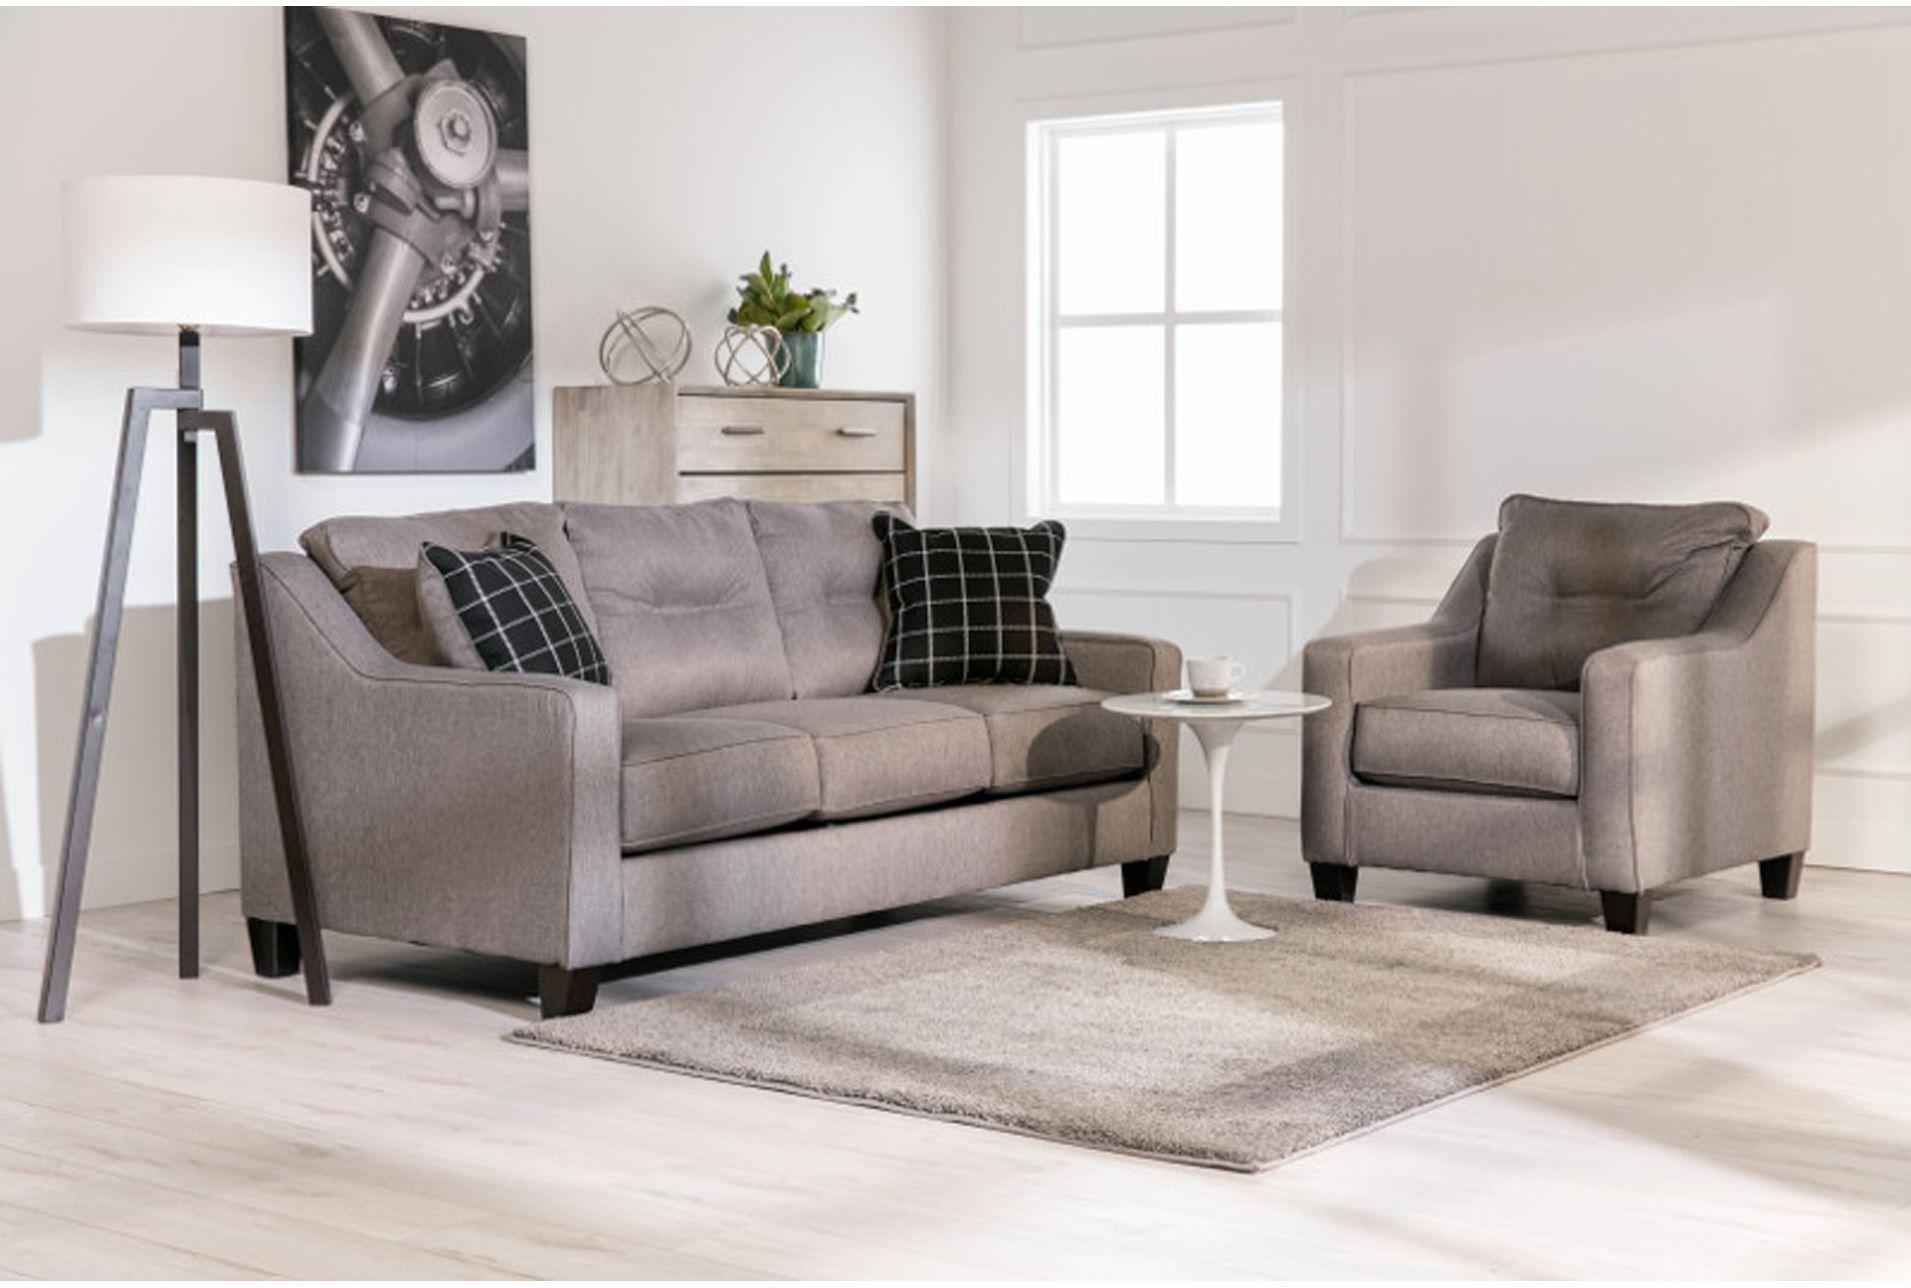 brindon charcoal queen sofa sleeper products queen sofa sleeper rh pinterest com